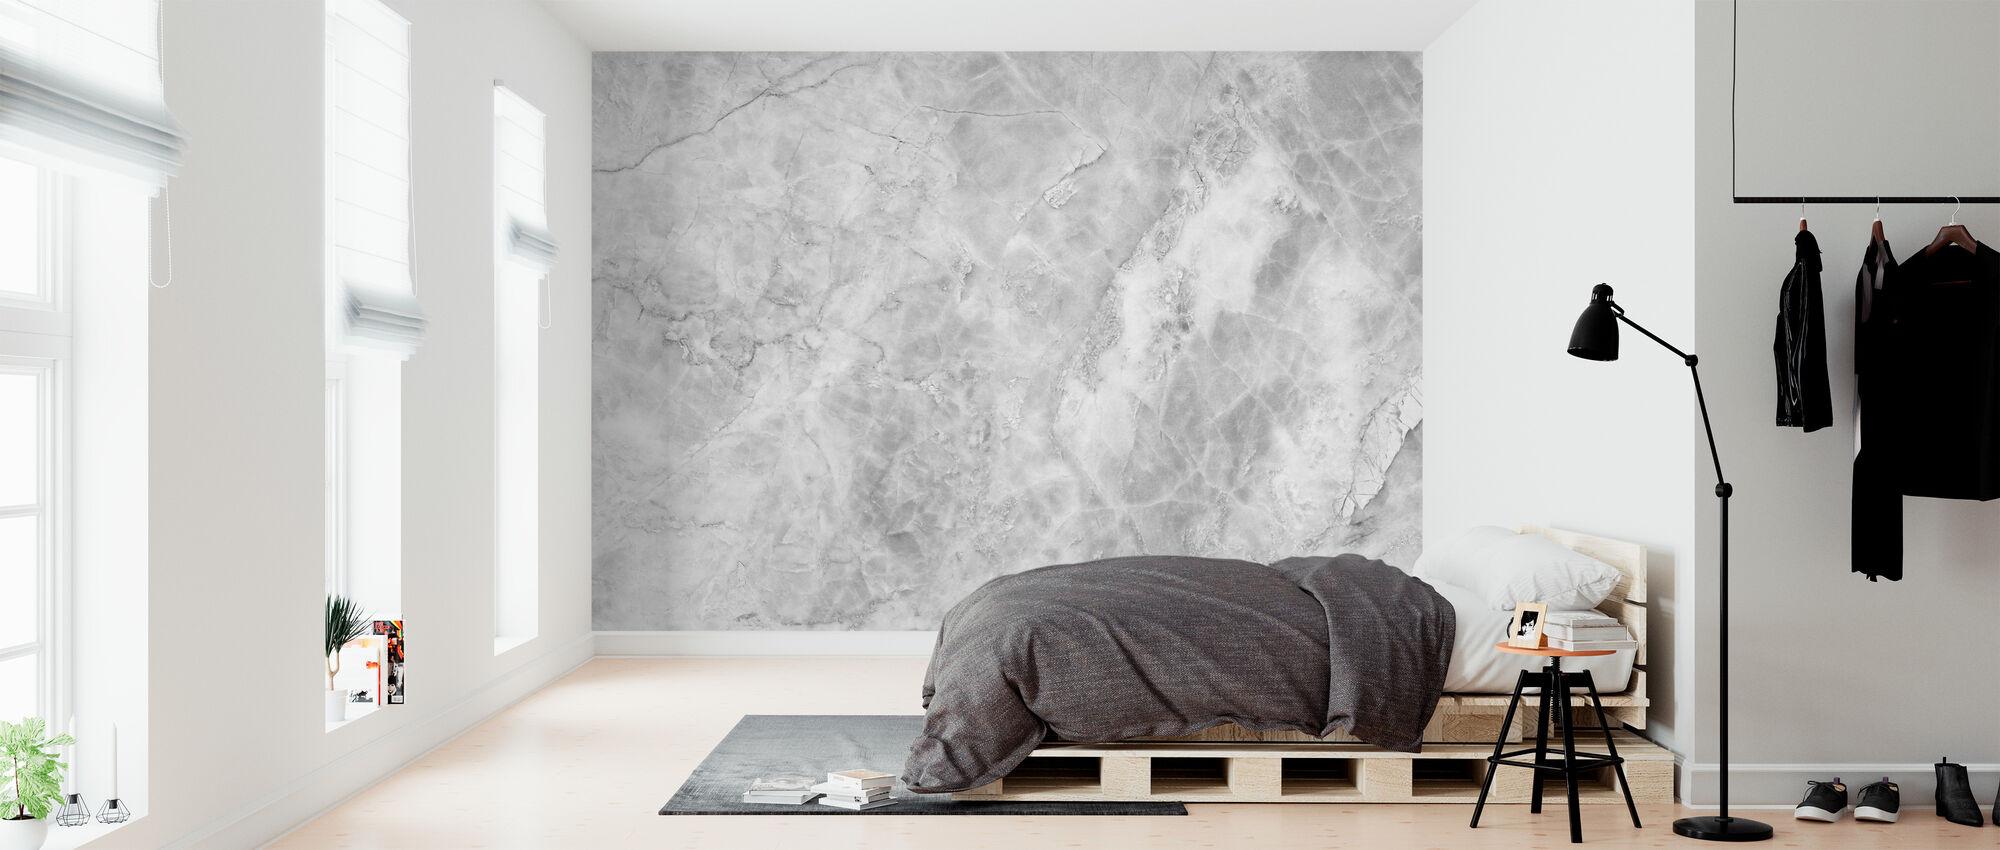 White Marble Background - Wallpaper - Bedroom